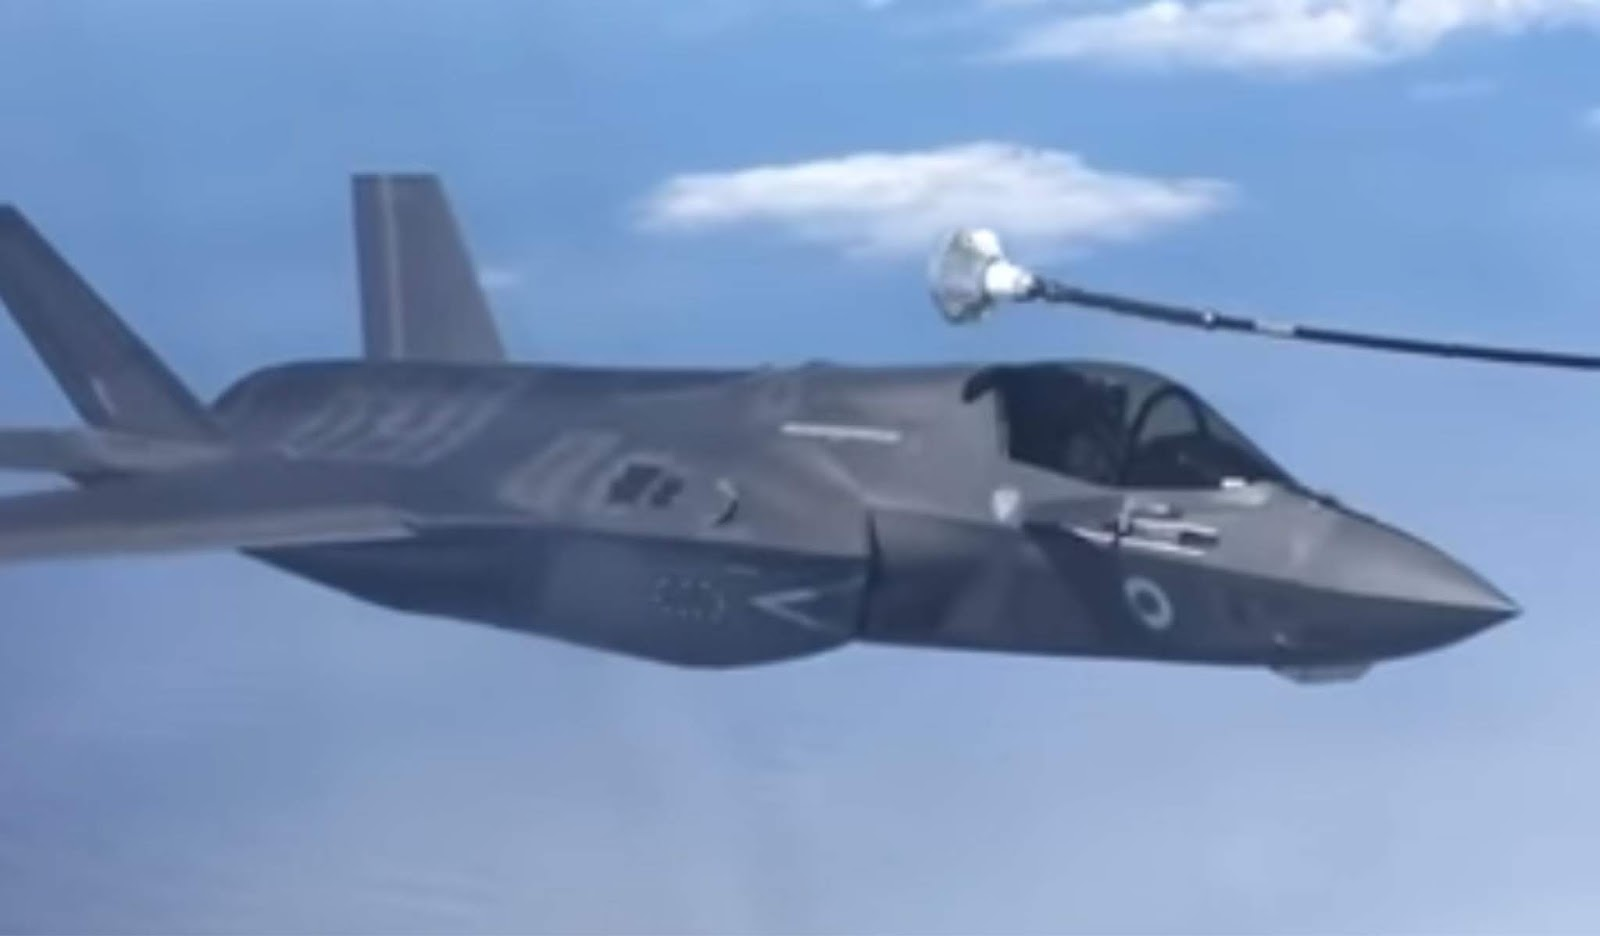 Kegagalan F-35 mengisi bahan bakar di udara di videokan